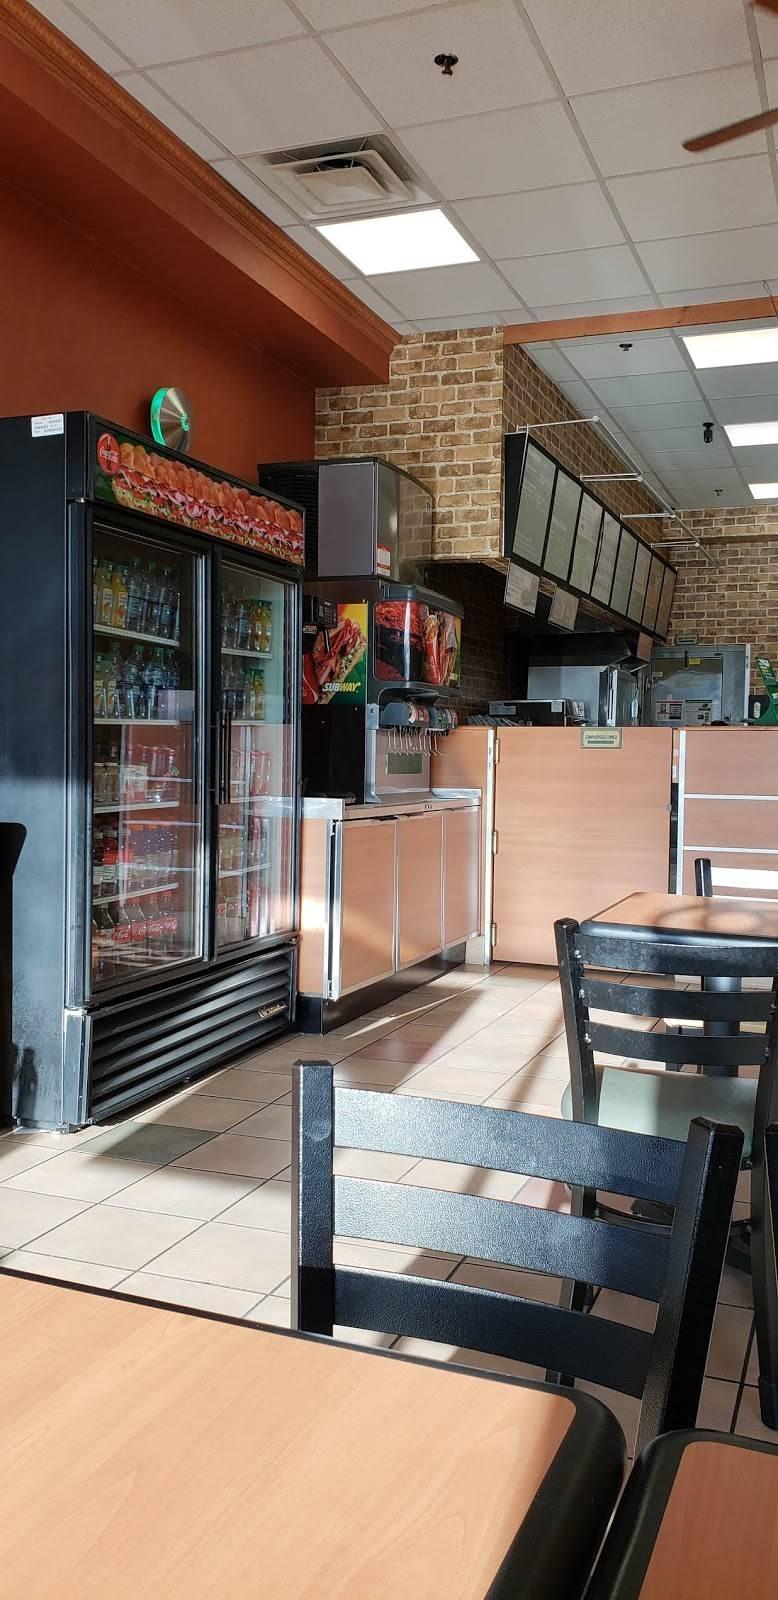 Subway Restaurants   restaurant   132-40 Metropolitan Ave, Richmond Hill, NY 11418, USA   7185269800 OR +1 718-526-9800